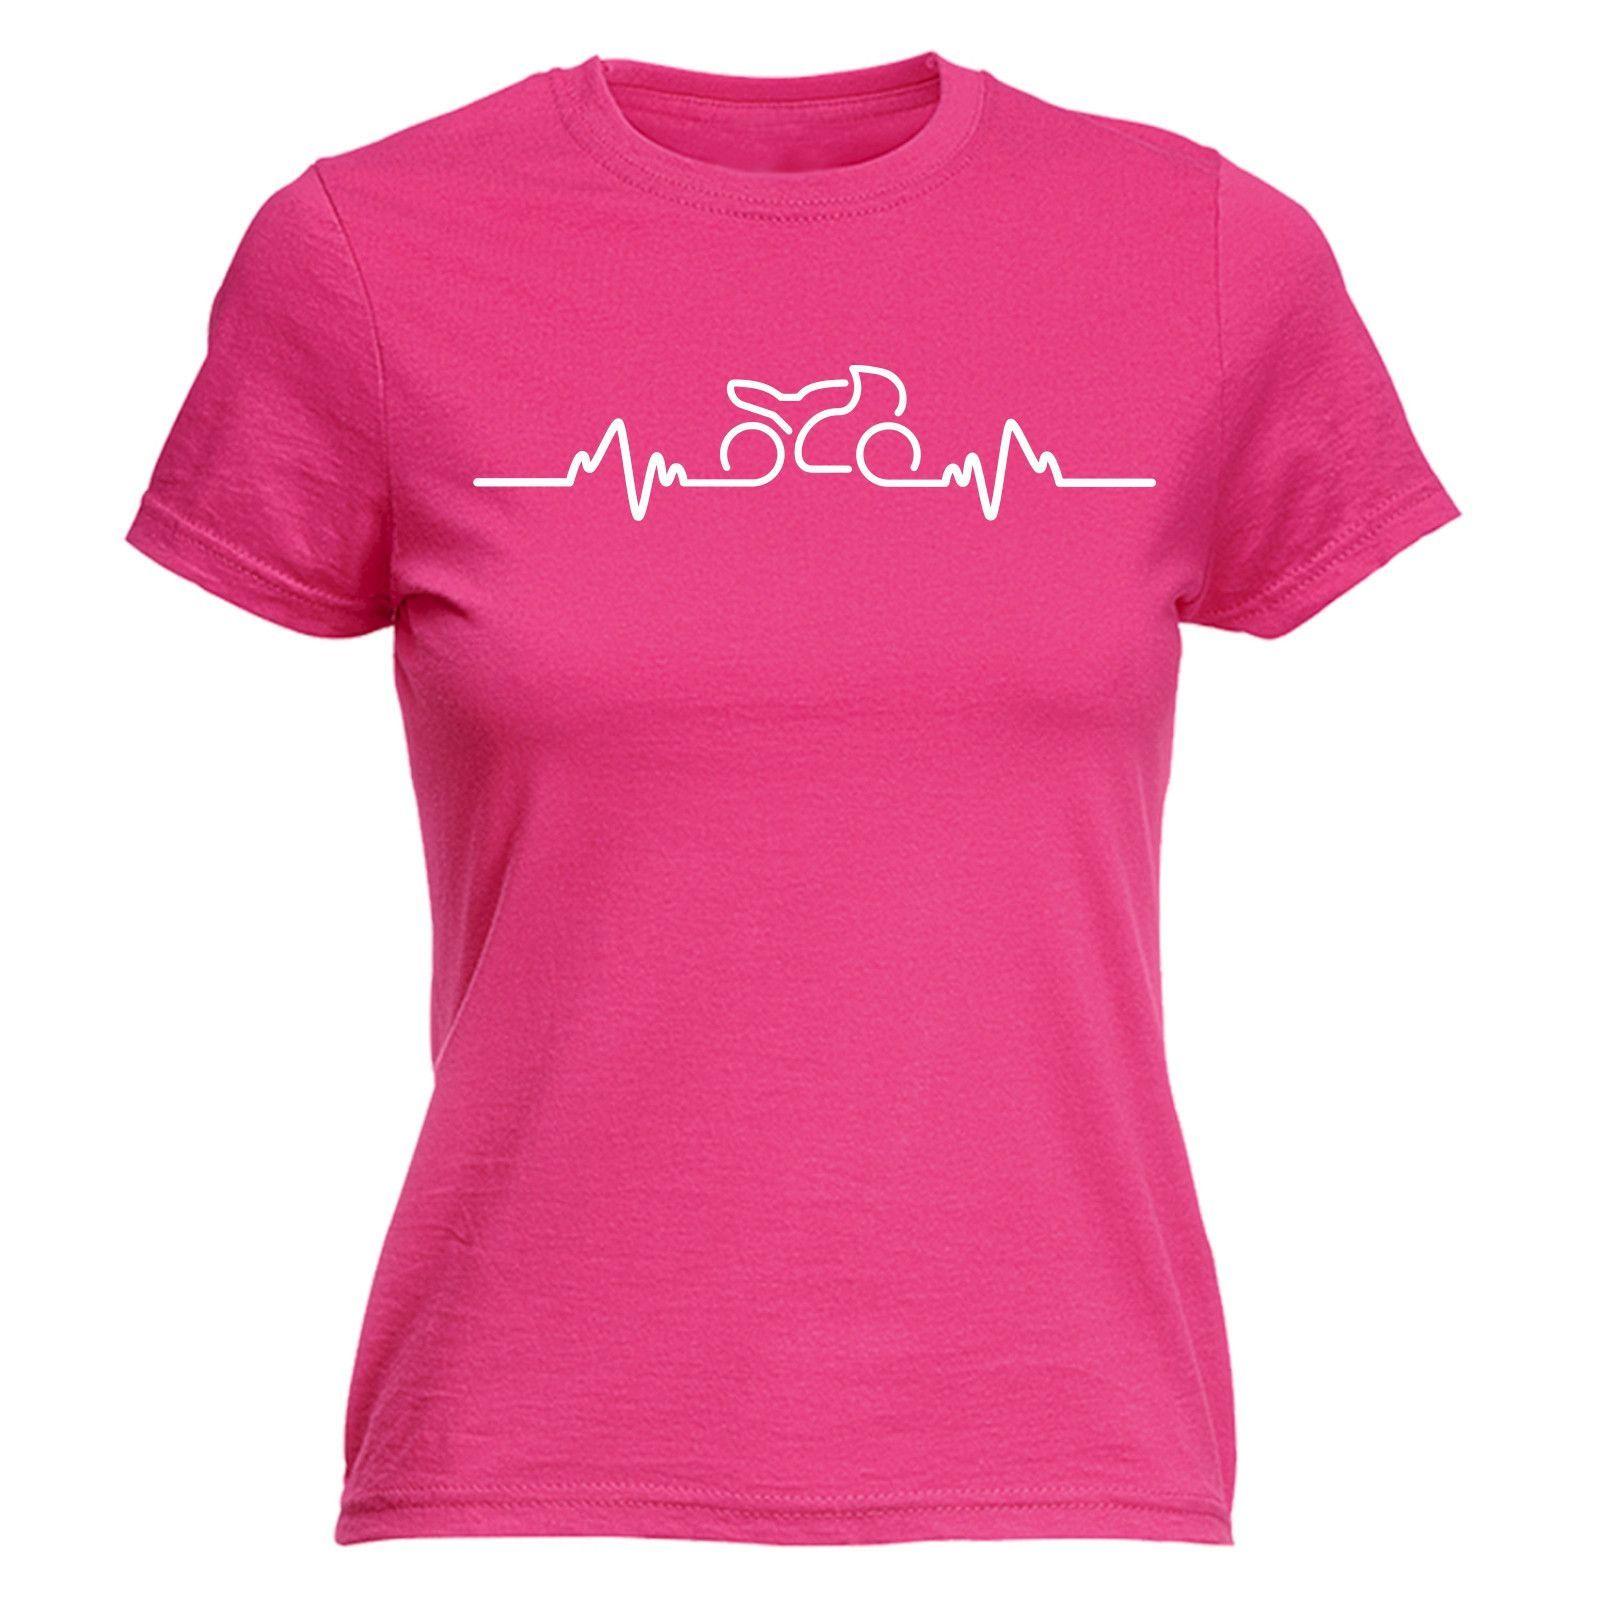 123t Women's Motorbike Pulse Funny T-Shirt – 123t T-Shirts & Hoodies